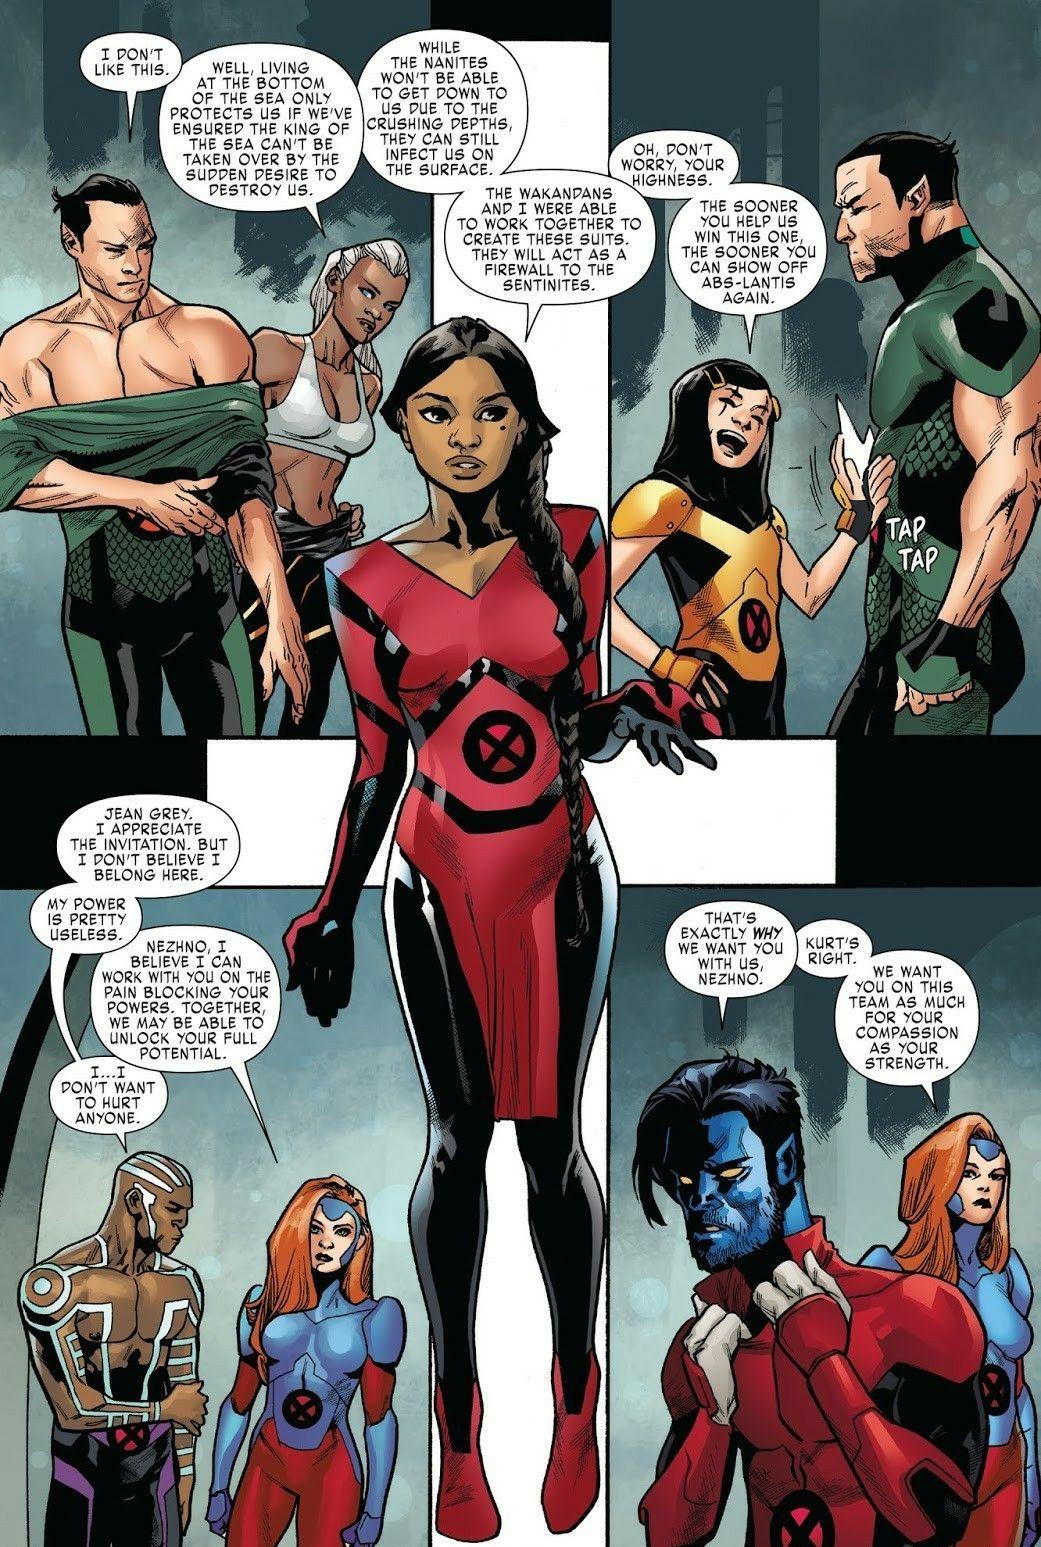 Wakandan S Help Trinary Develop Tech Suits To Resist Sentinite Technology X Men Red 3 Or 4 Xmen Comics Black Comics Marvel Women